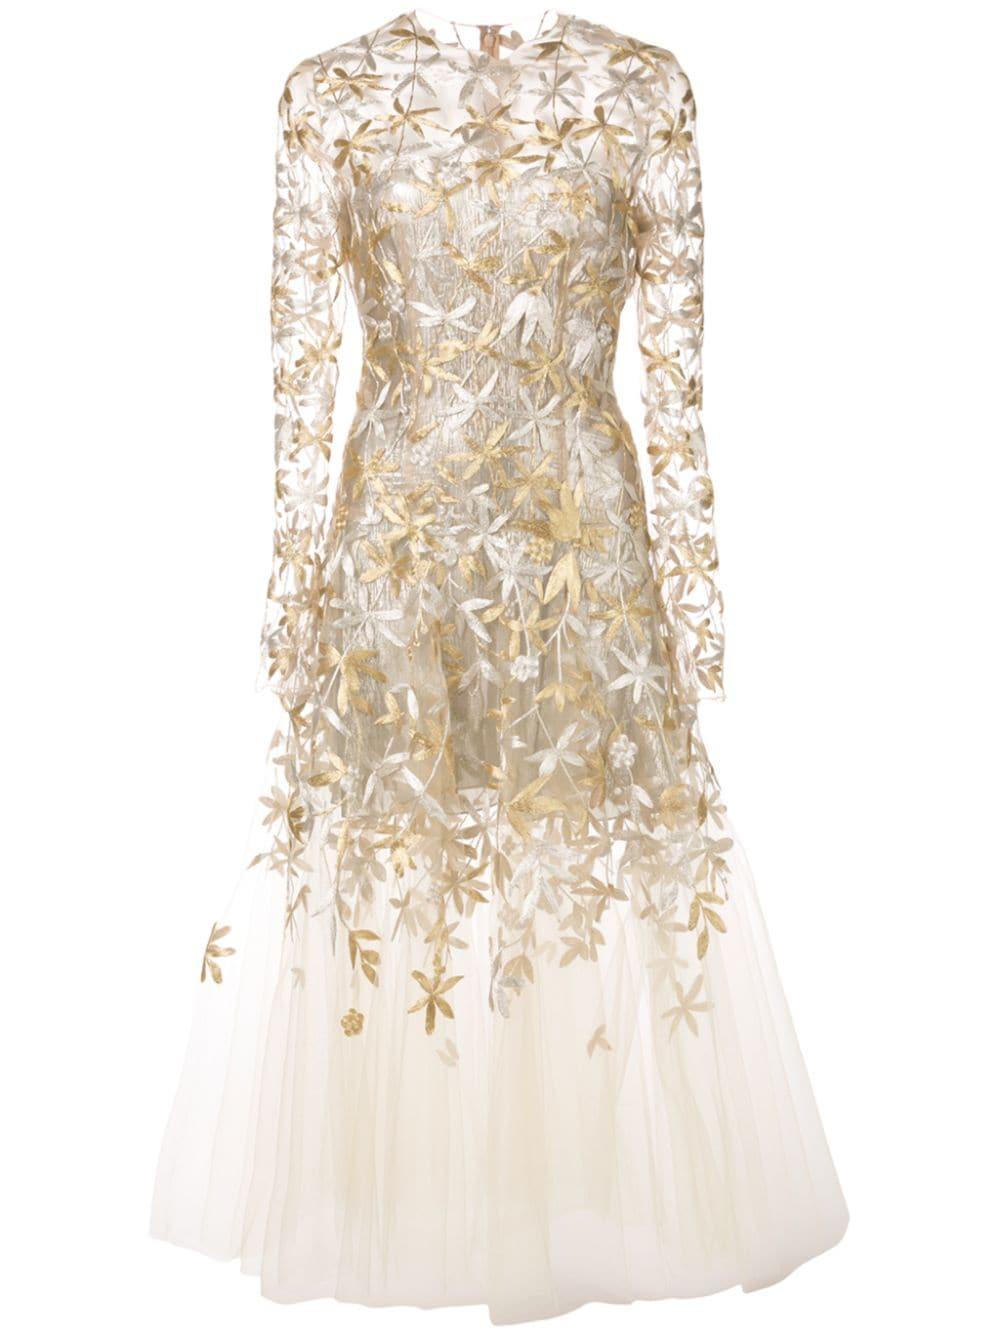 Oscar De La Renta Sheer Styled Ballet Dress We Select